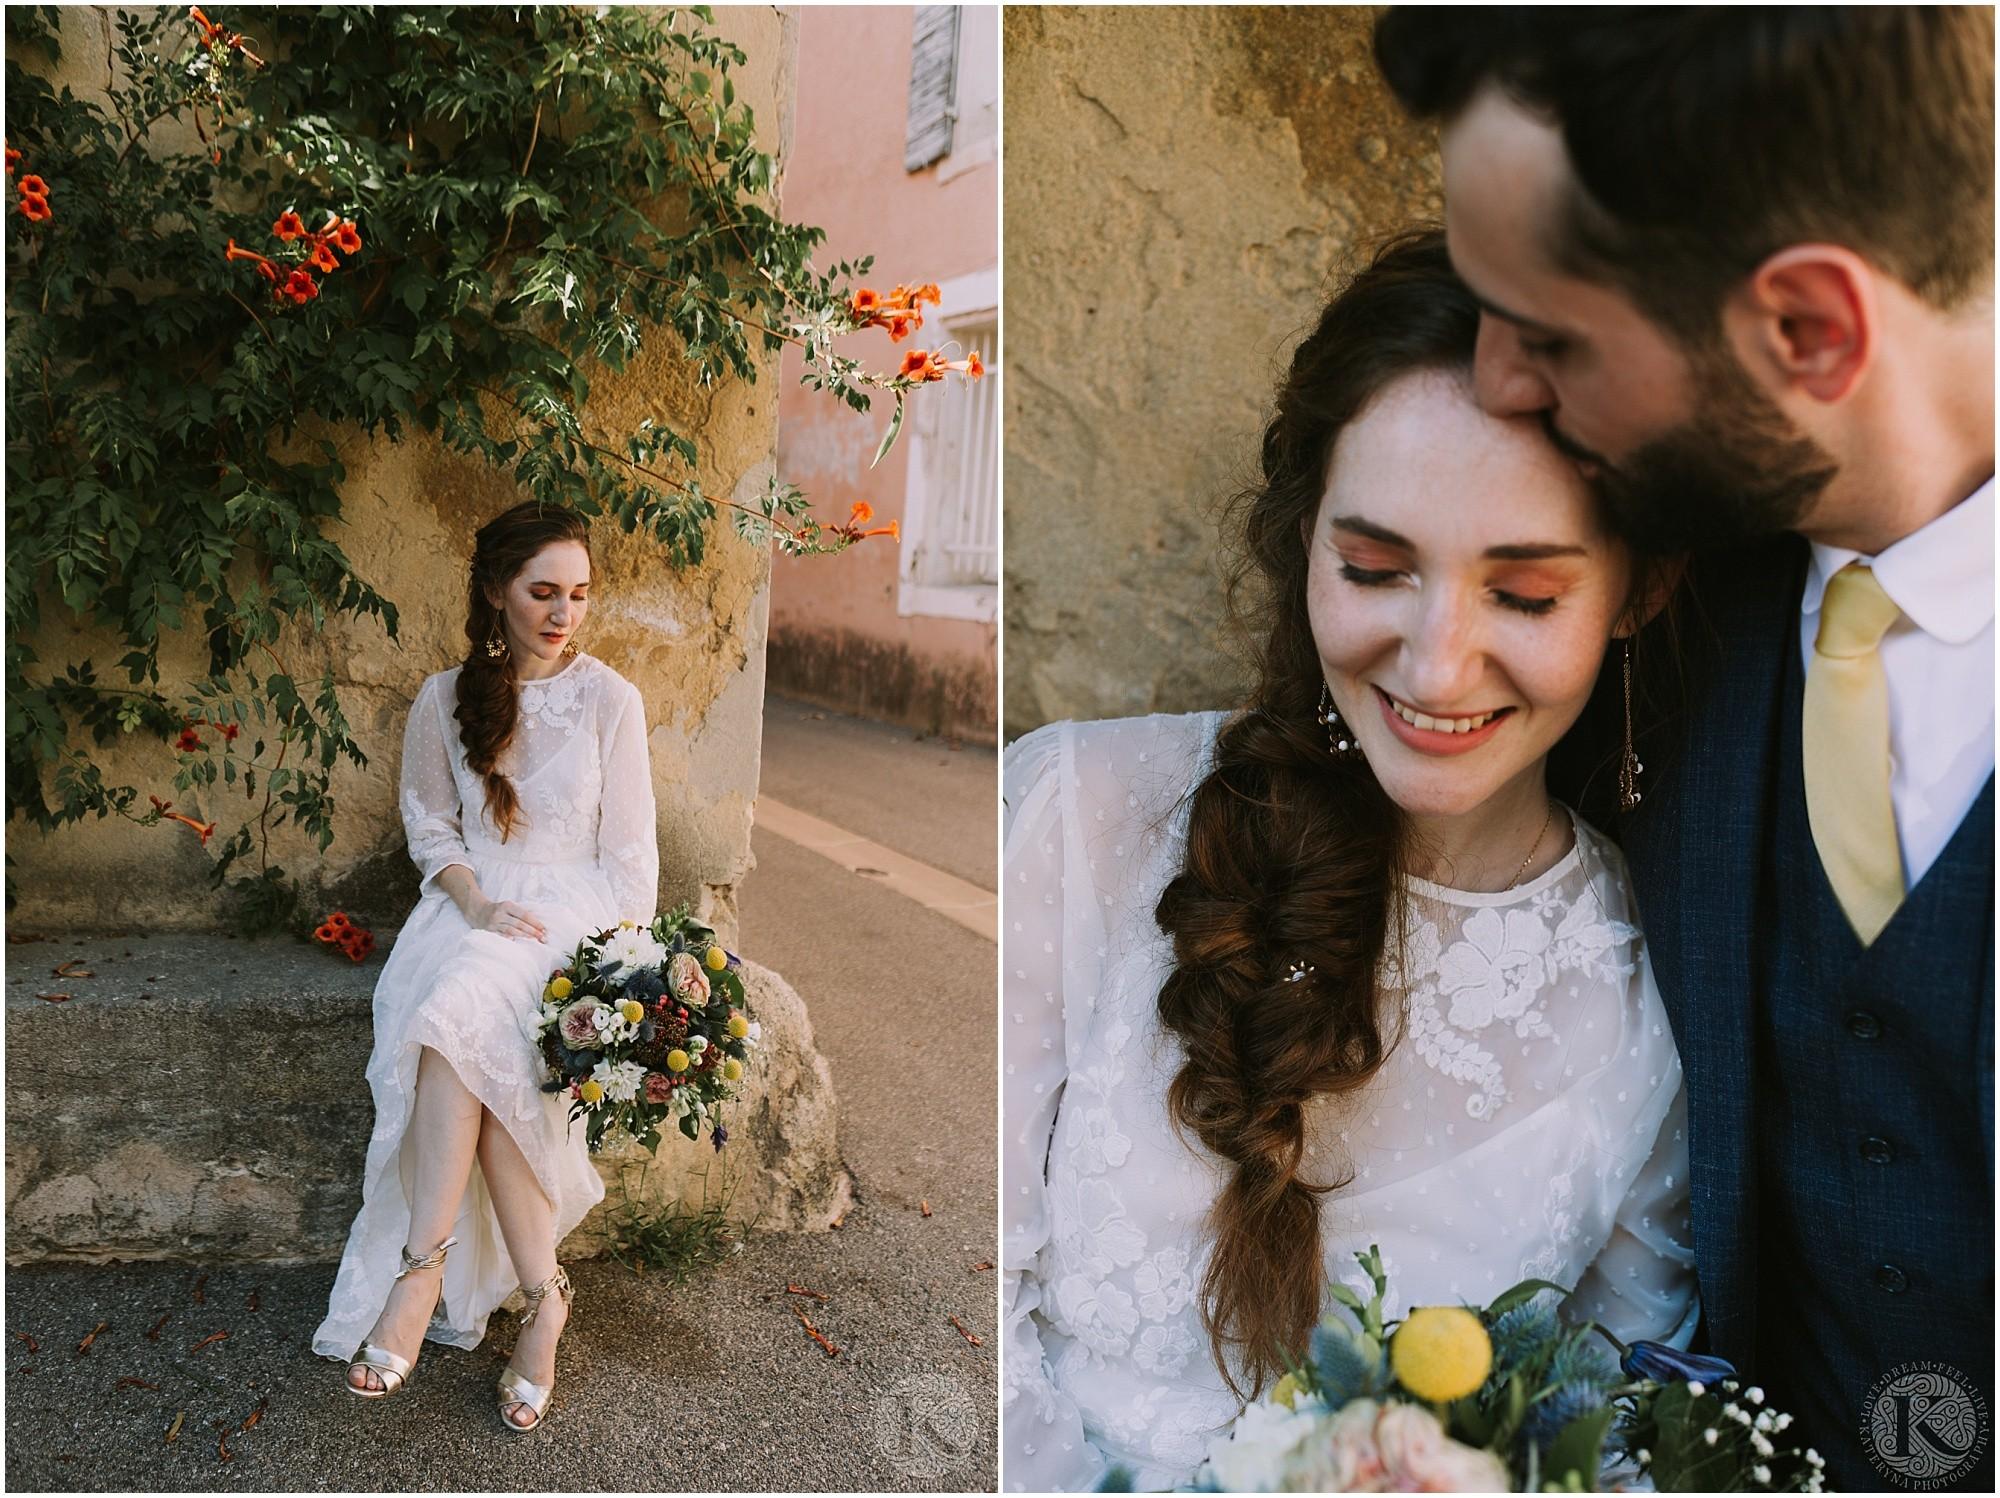 Kateryna-photos-photographe-mariage-vaucluse-provence-avignon-ferme-st-hugues_0046.jpg